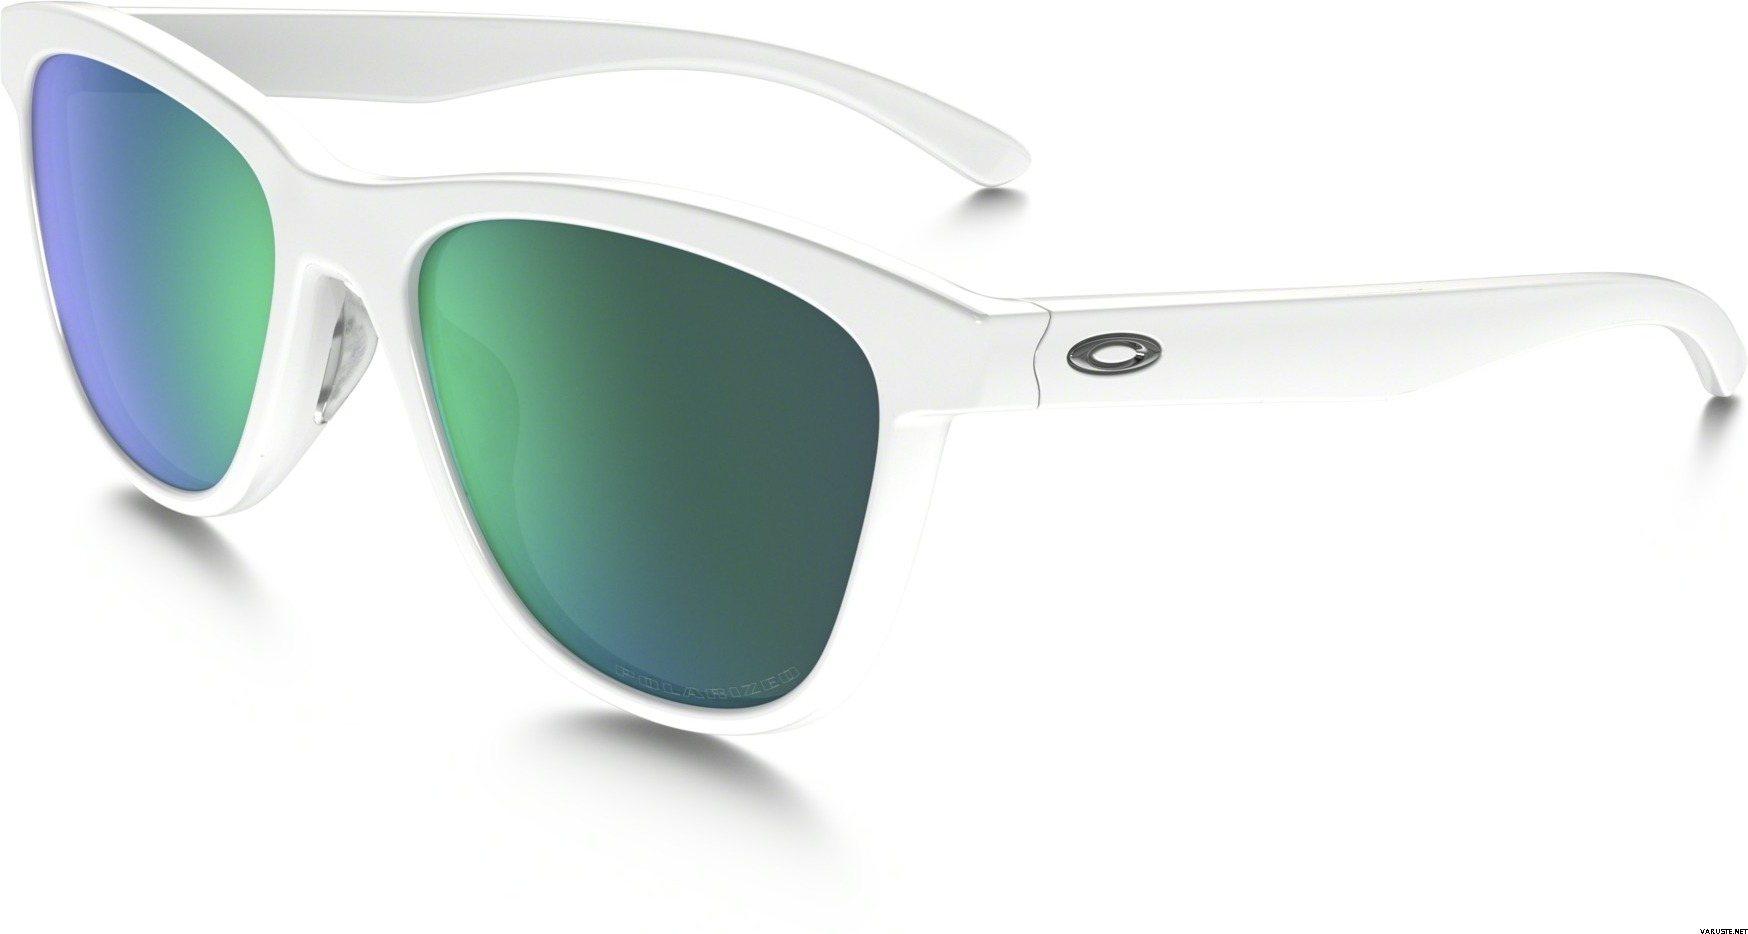 Oakley Moonlighter Sonnenbrille Polished White/Jade Iridium gcGozP9